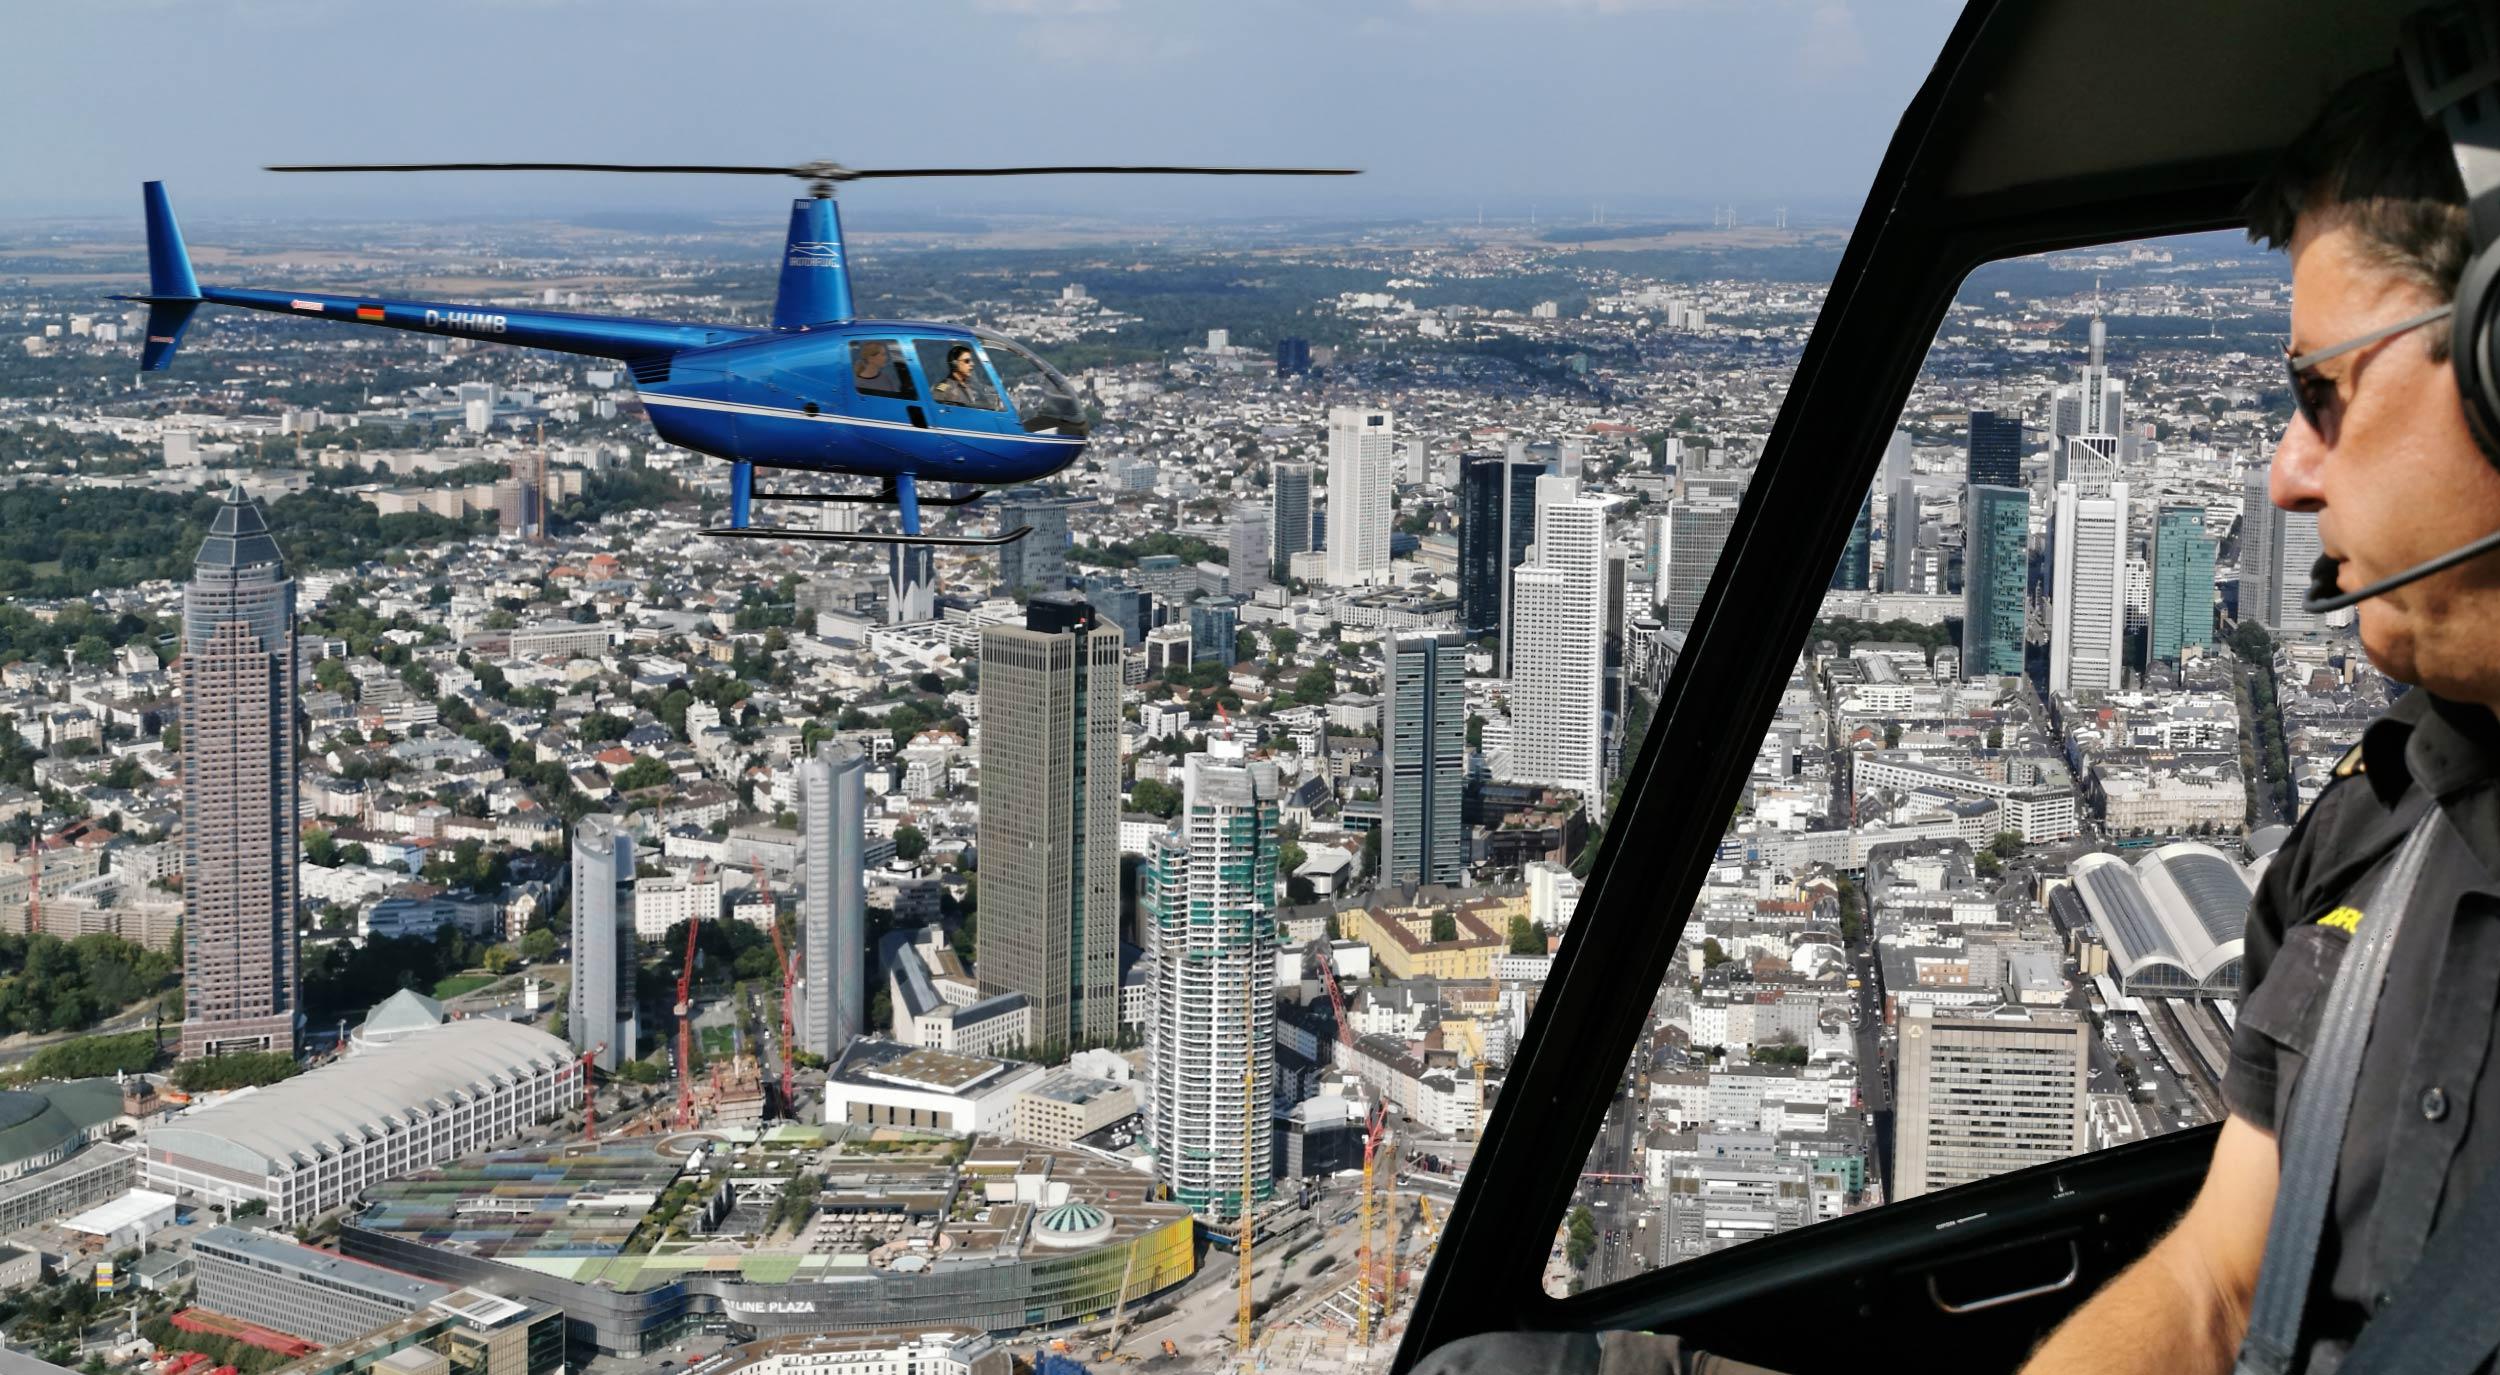 Frankfurt Helicopter Tour – Sightseeing Flight over Frankfurt